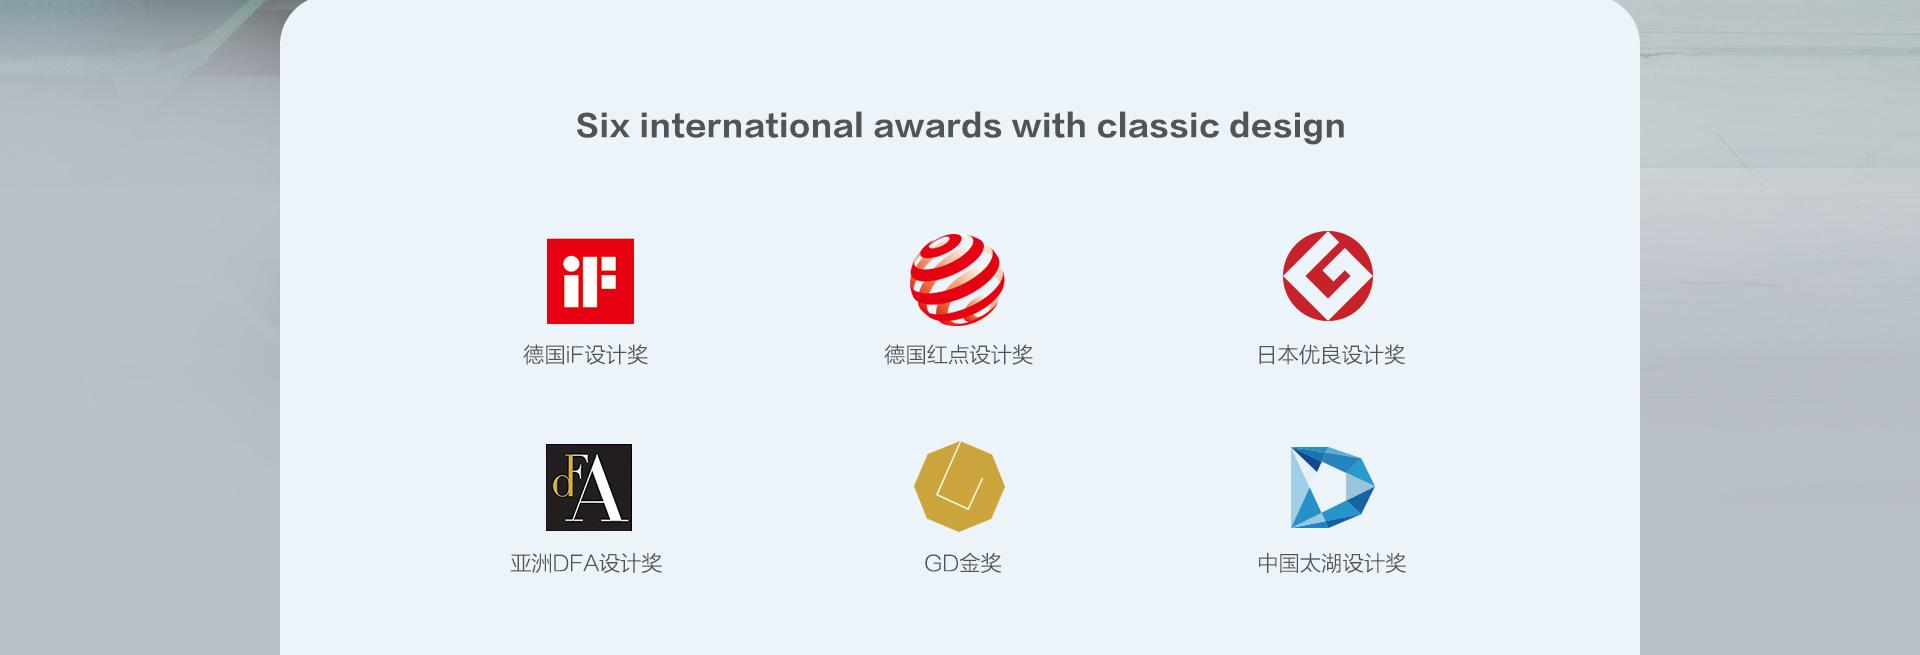 Xiaomi-Roidmi-NEX-Aspirapolvere-Senza-Fili (11).jpg